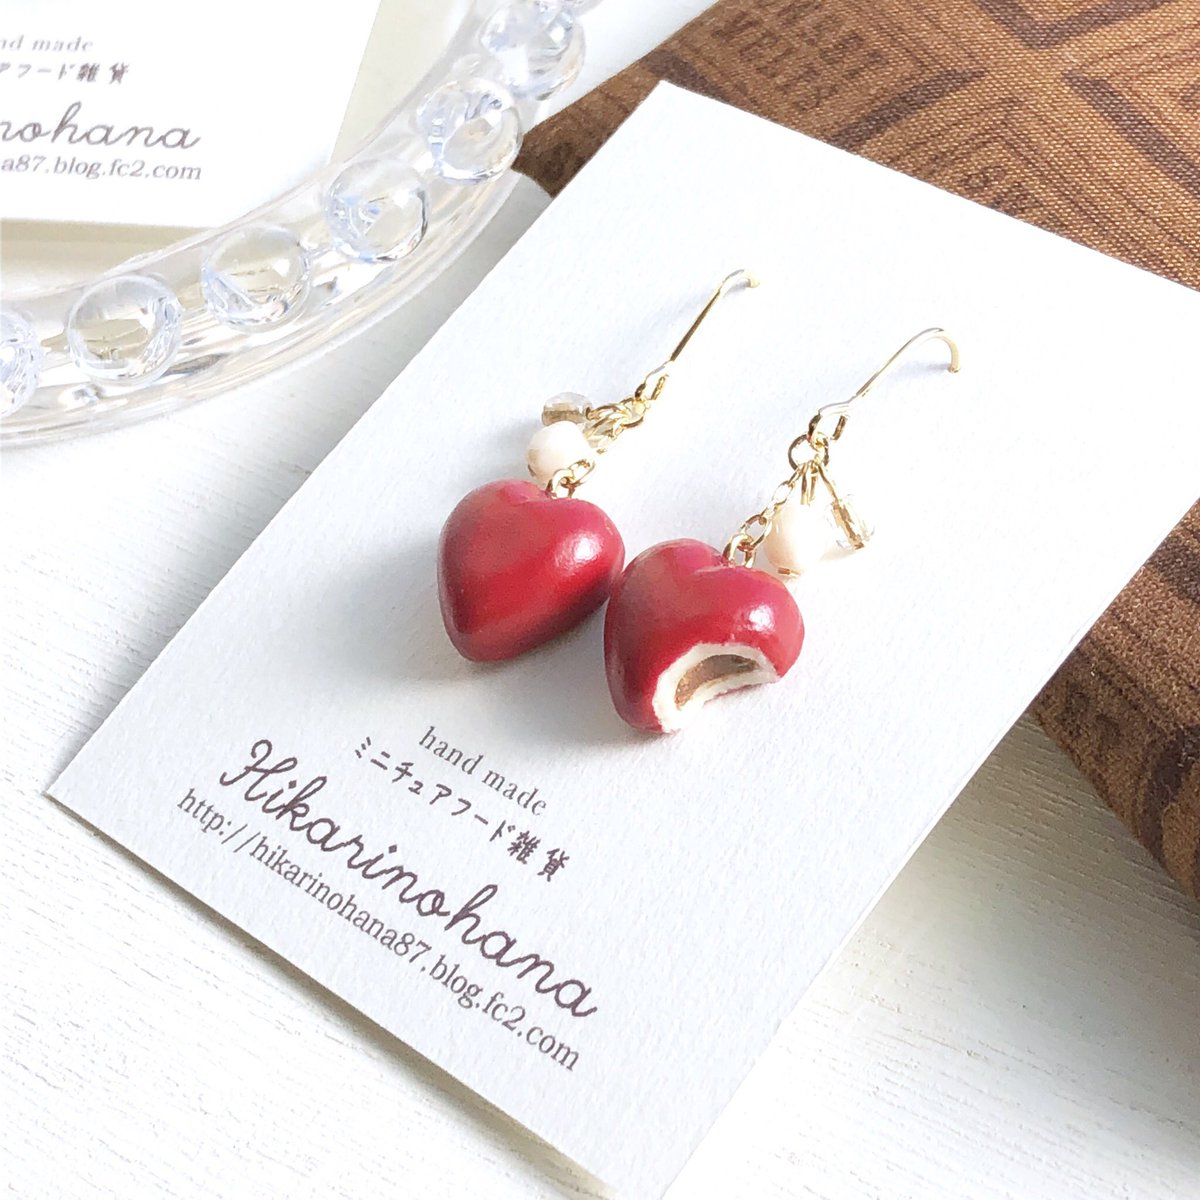 test ツイッターメディア - Miniature chocolate earrings. 🍫❤️🍫❤️  バレンタインに向け 今年もハートのチョコレートを作ったよ。  100円ショップのチョコハンカチも一緒に。可愛くて #キャンドゥ で大人買いです。笑 これからの時期、お菓子雑貨も増えてワクワクするね。  #ミニチュア #ハンドメイドピアス #スイーツ柄 https://t.co/5Mj17VUNud